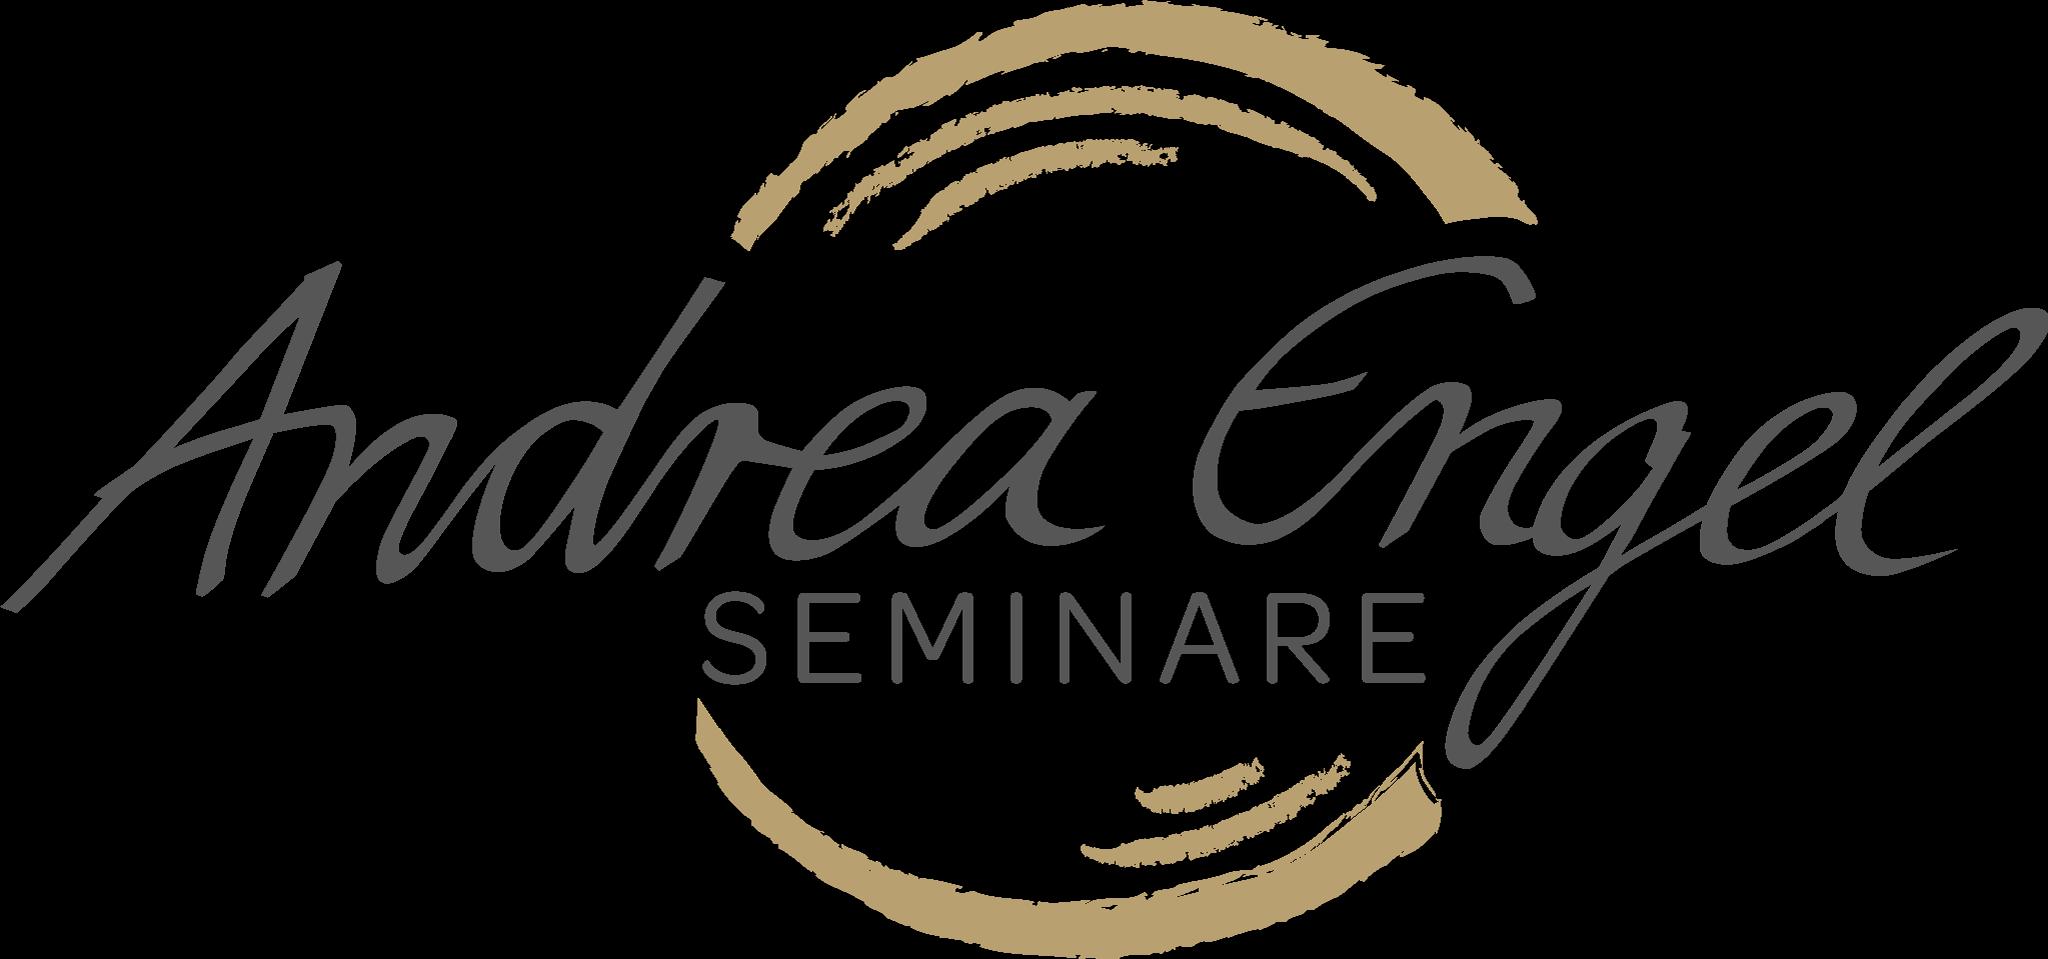 Andrea Engel Seminare